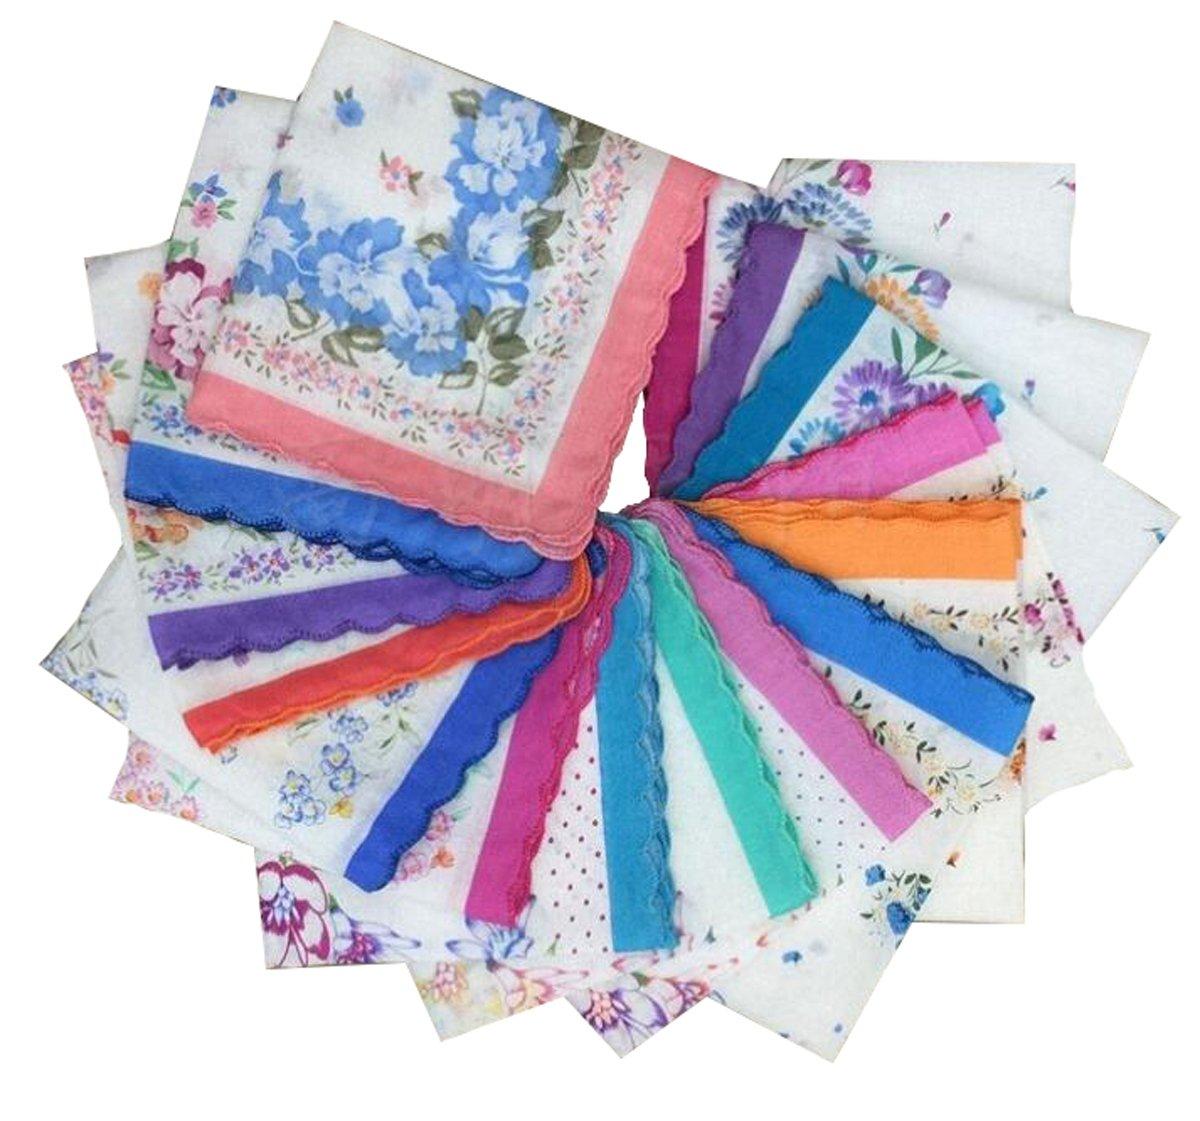 VEBE Womens/Girls Vintage Floral Wedding Party Cotton Handkerchiefs 1